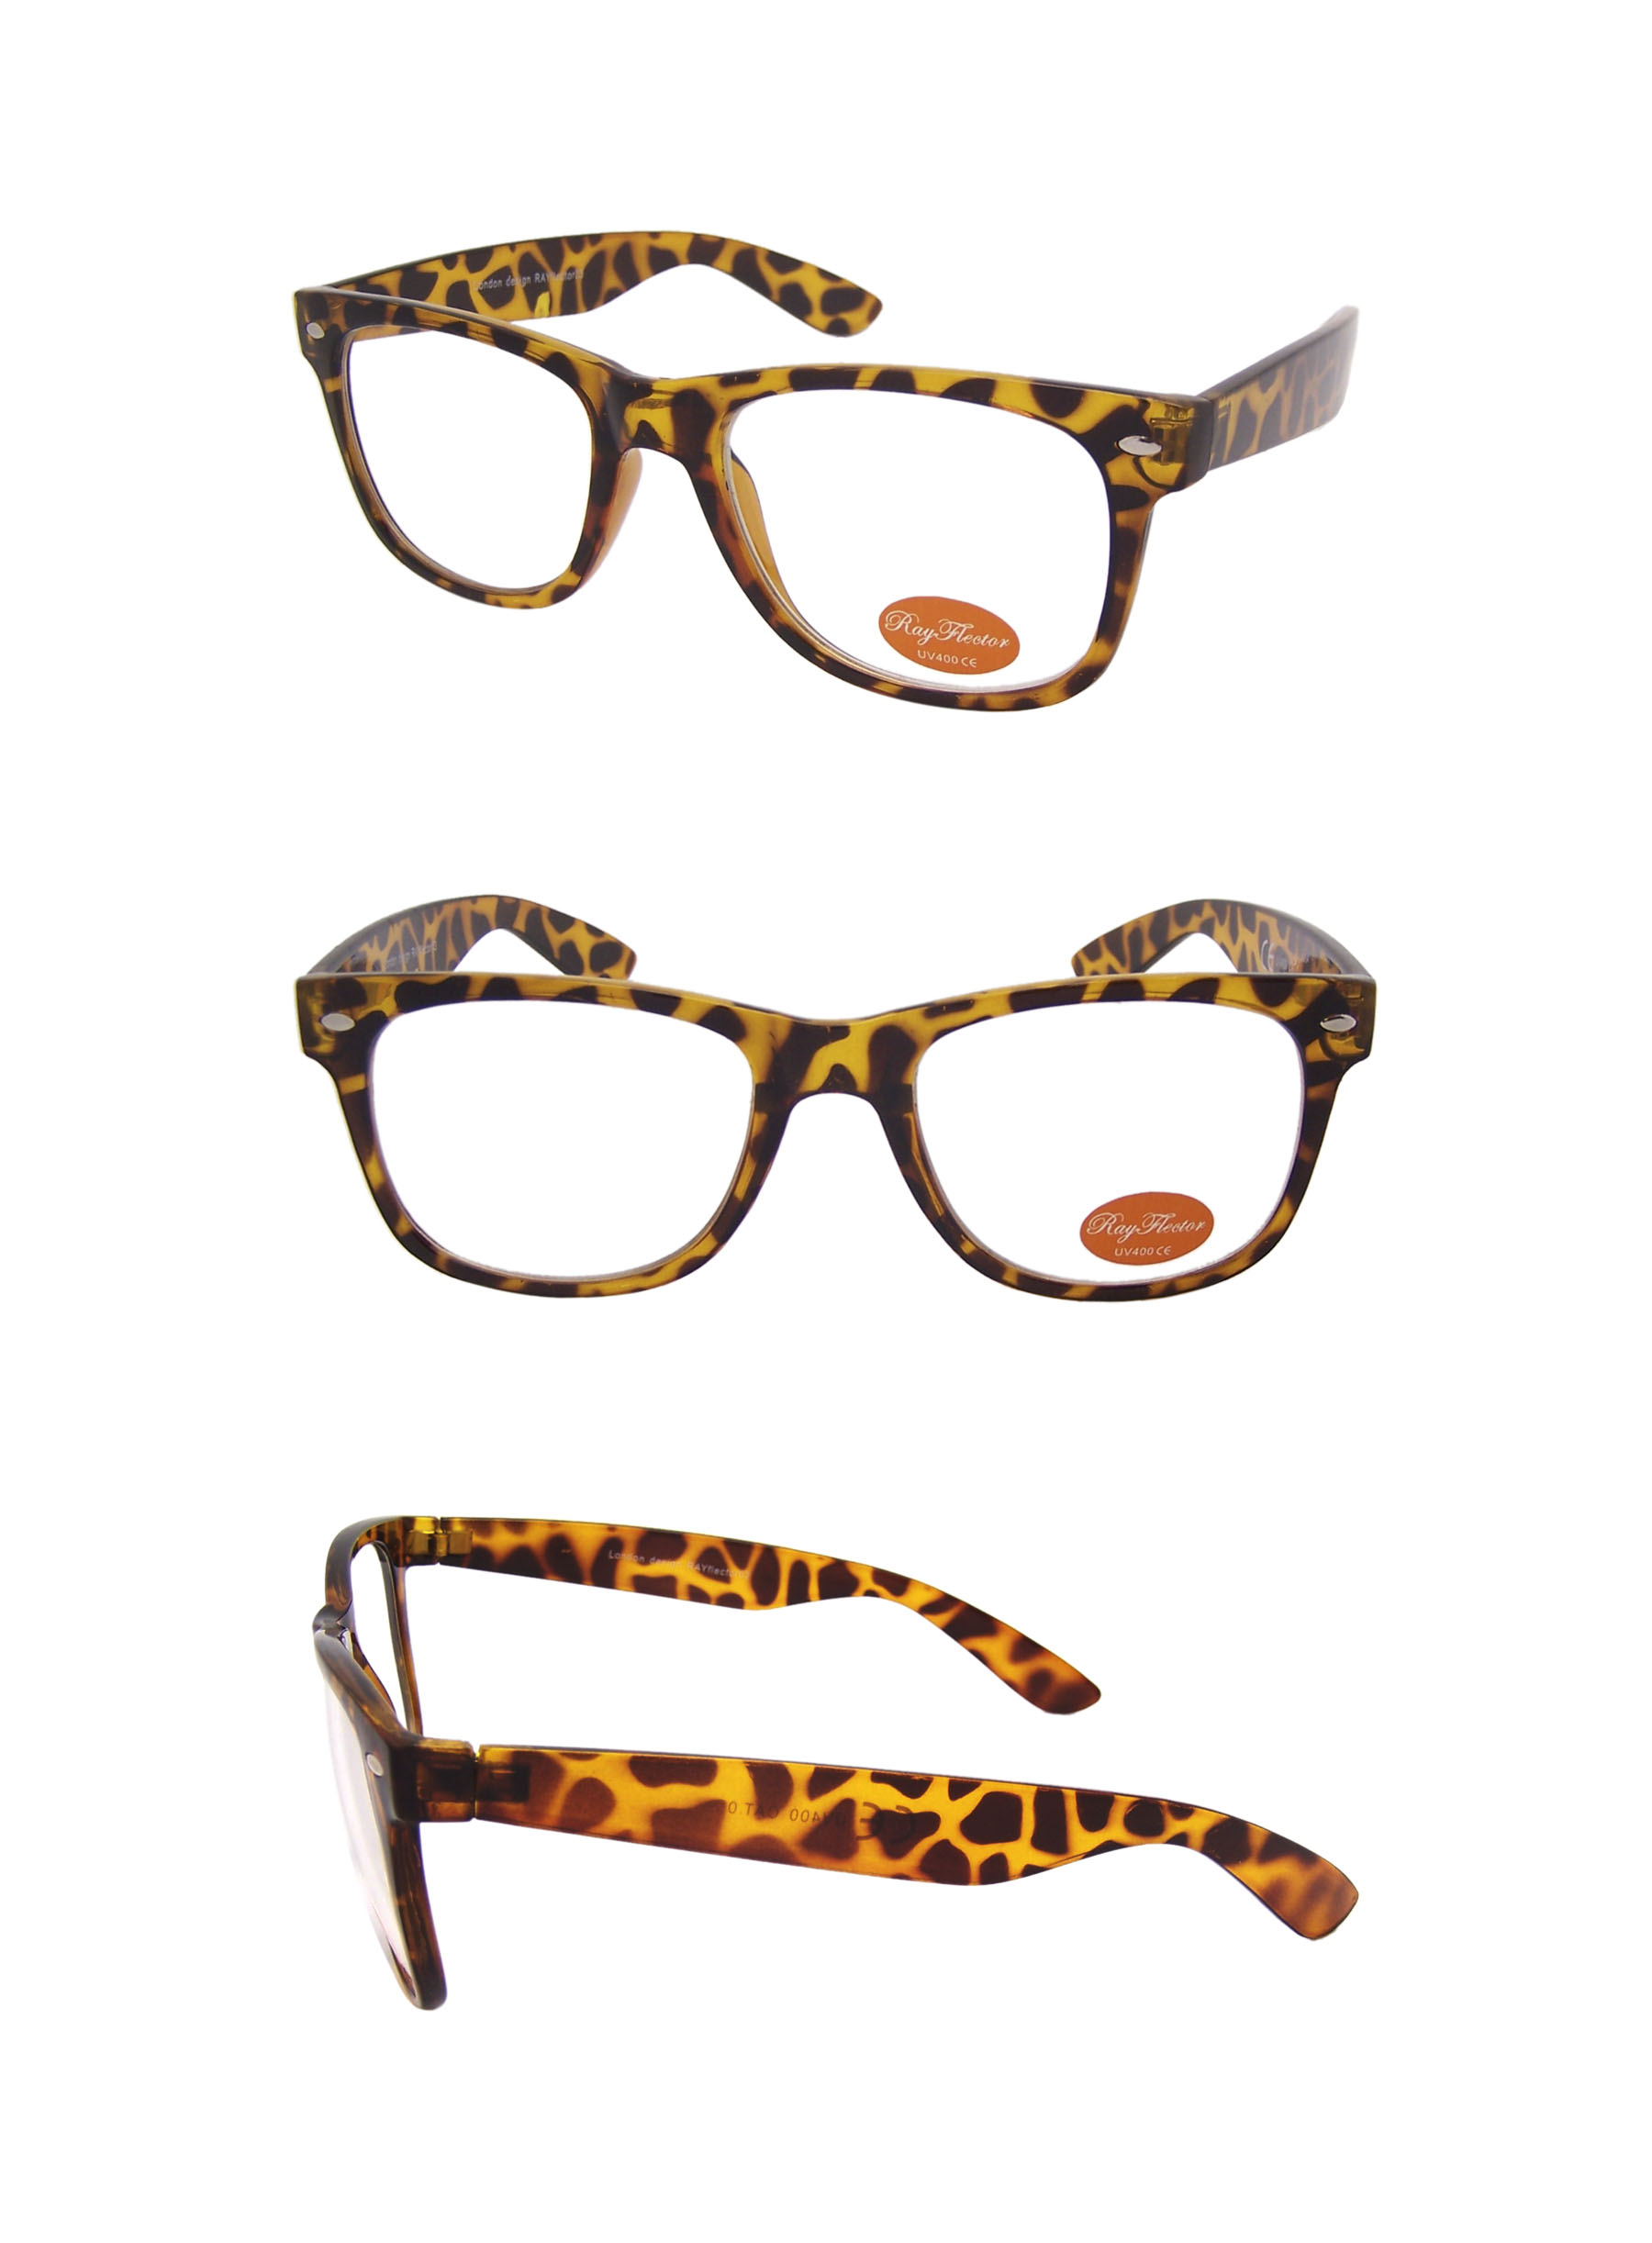 372aada7dca Classic Modern Clear Lens Wayfarer Style Sunglasses